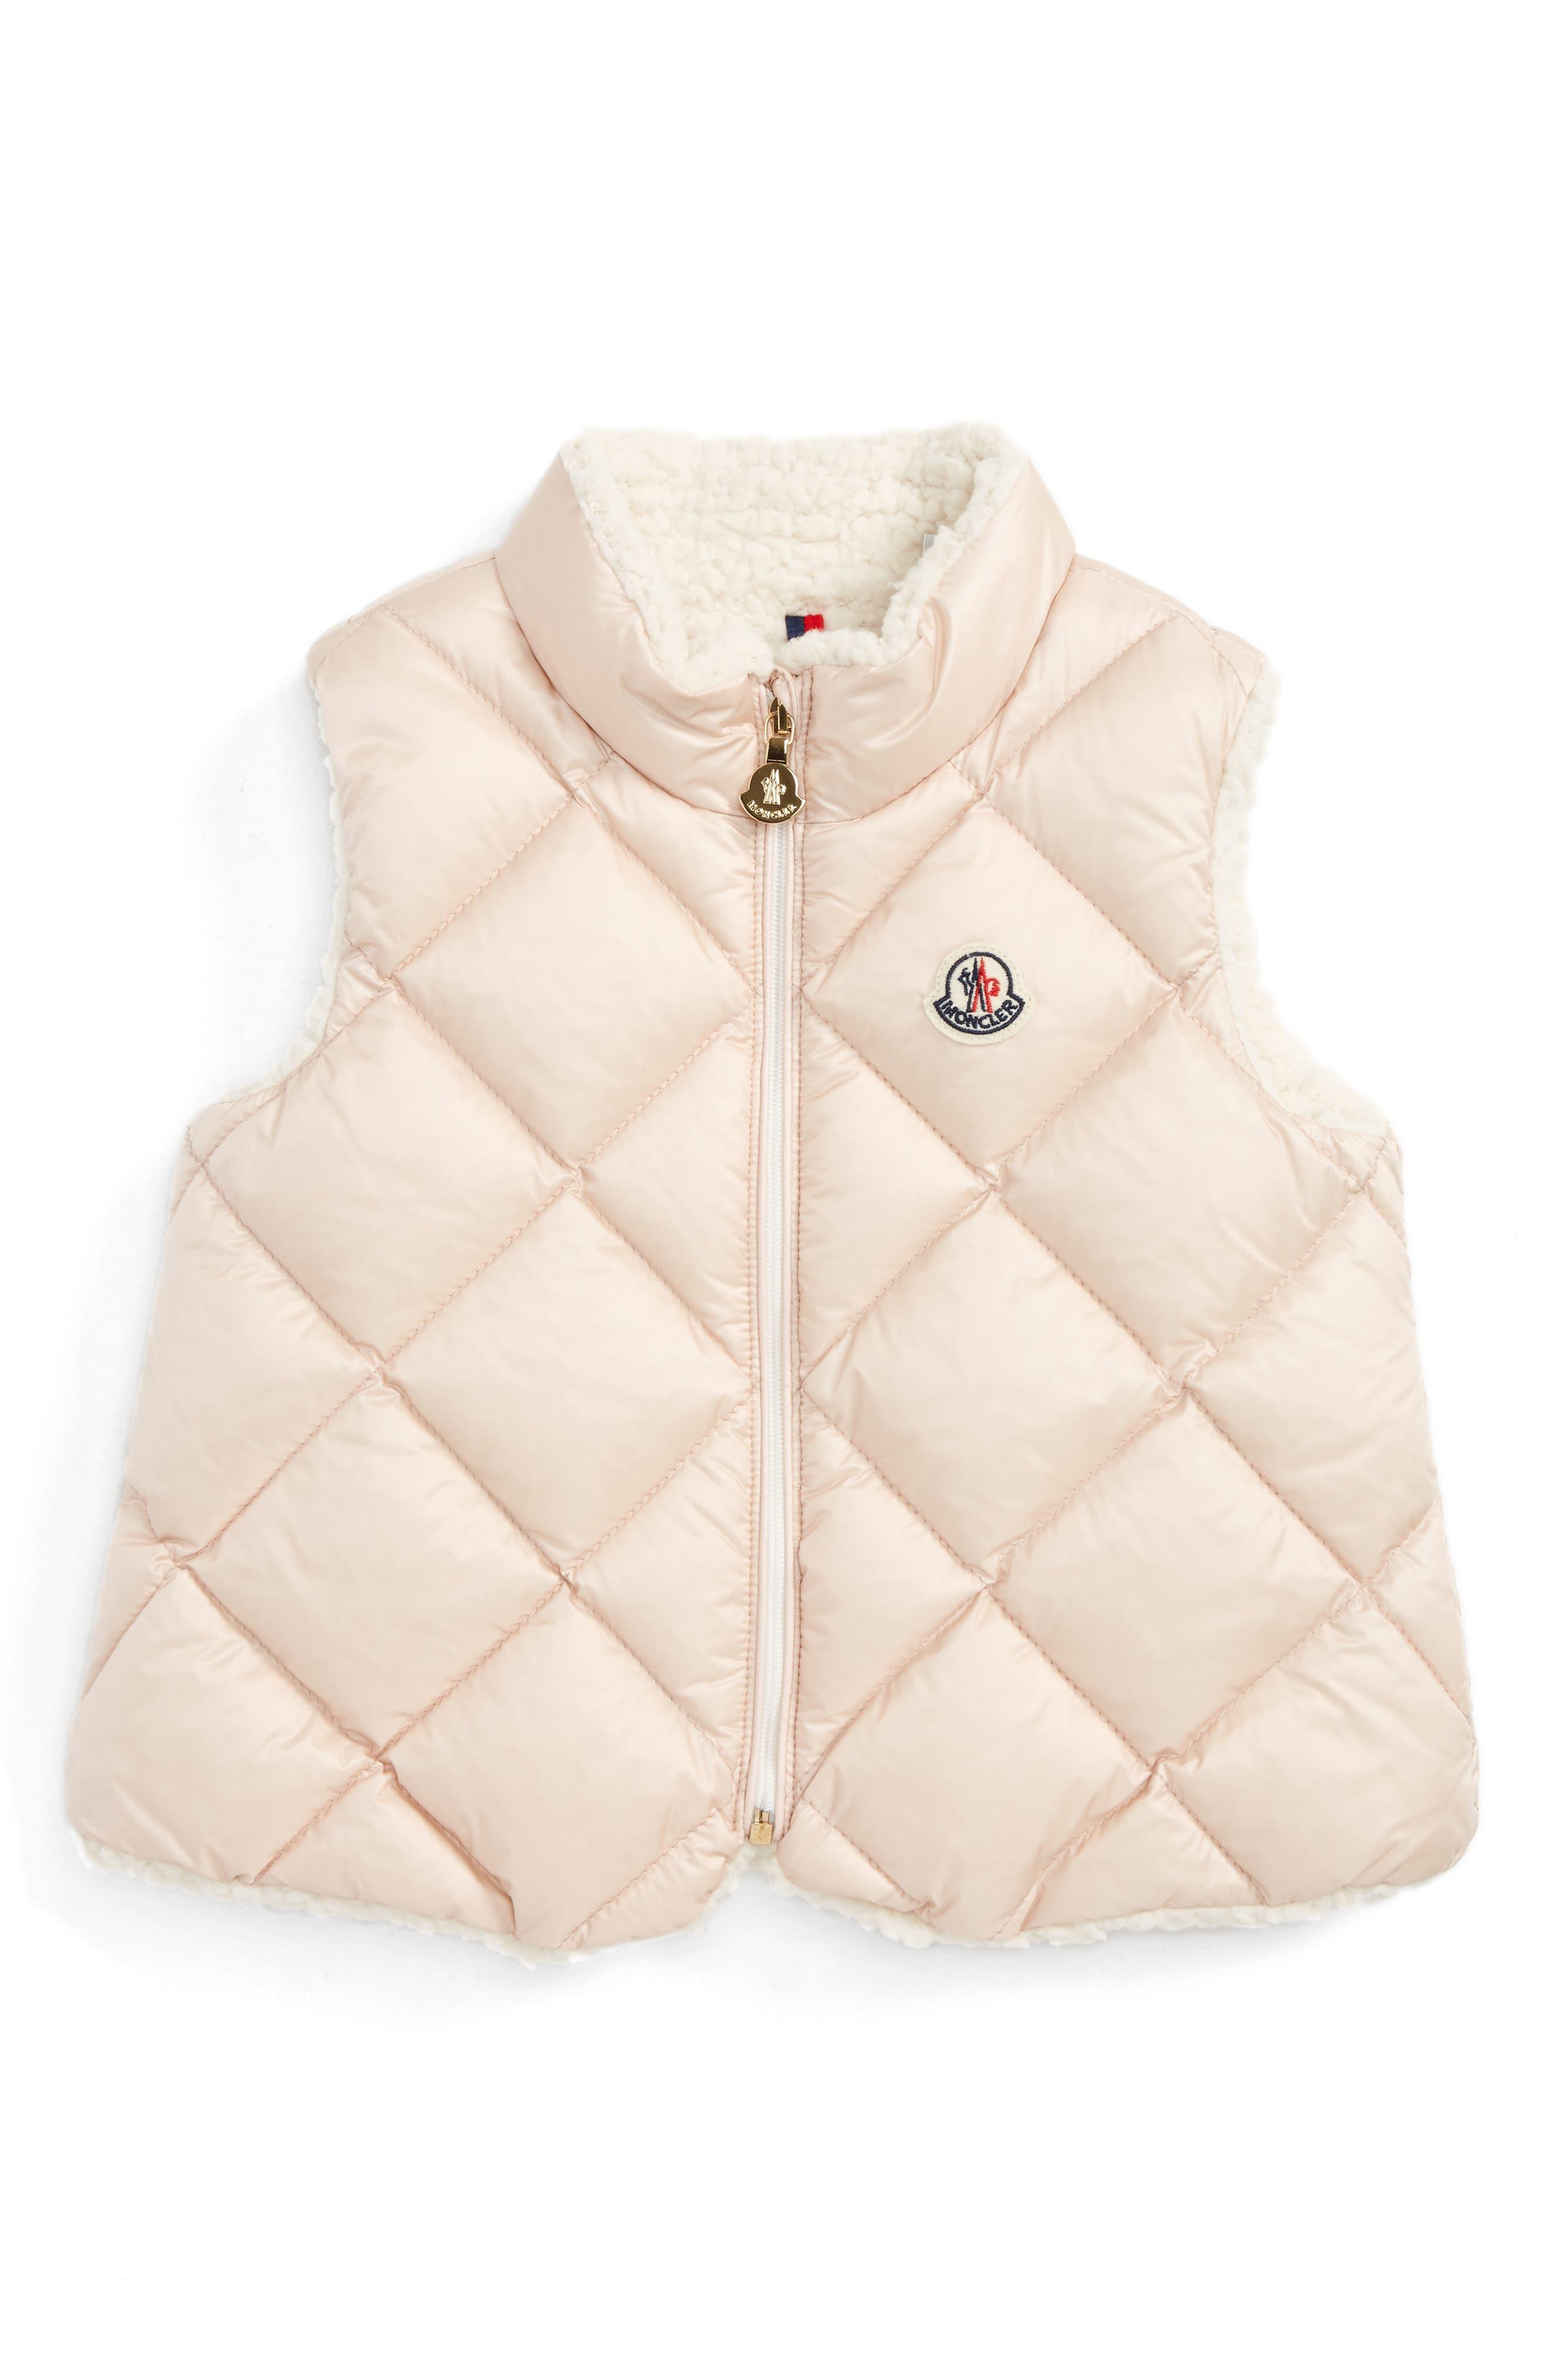 Alternate Image 1 Selected - Moncler Ysaline Down & Fleece Lined Vest (Baby Girls & Toddler Girls)